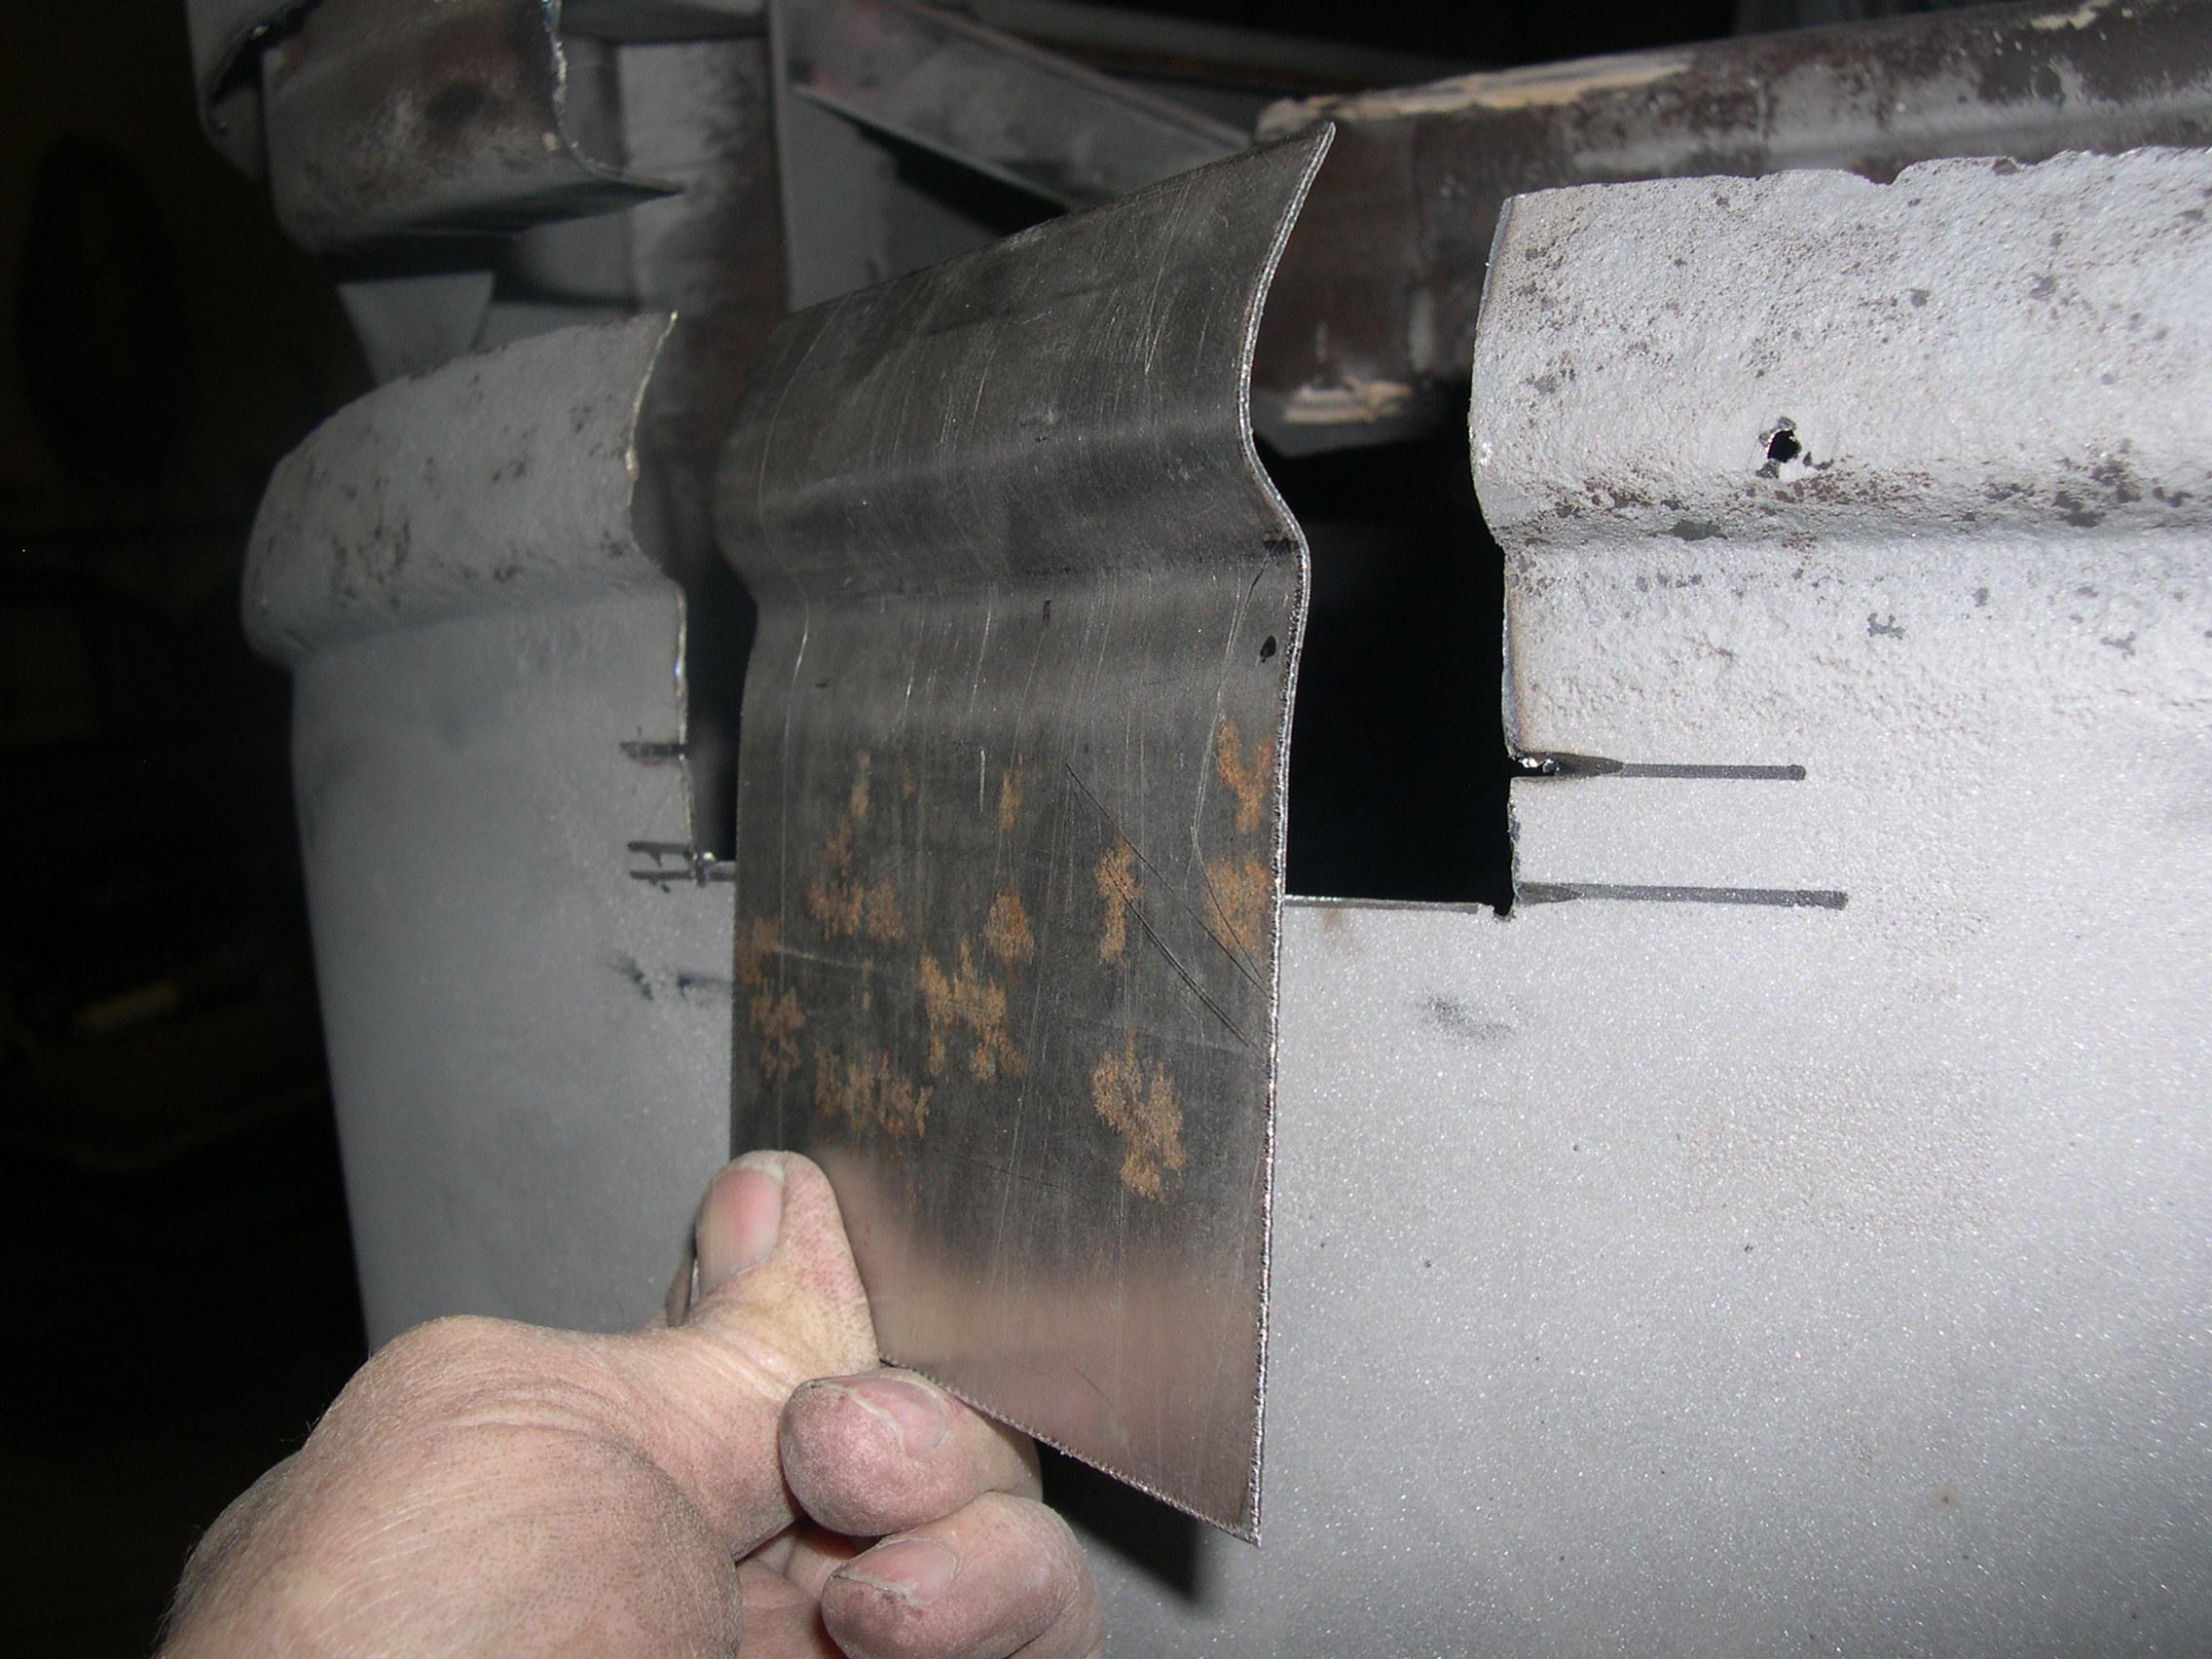 Patch panels for inner portion of beltline reveal were formed.